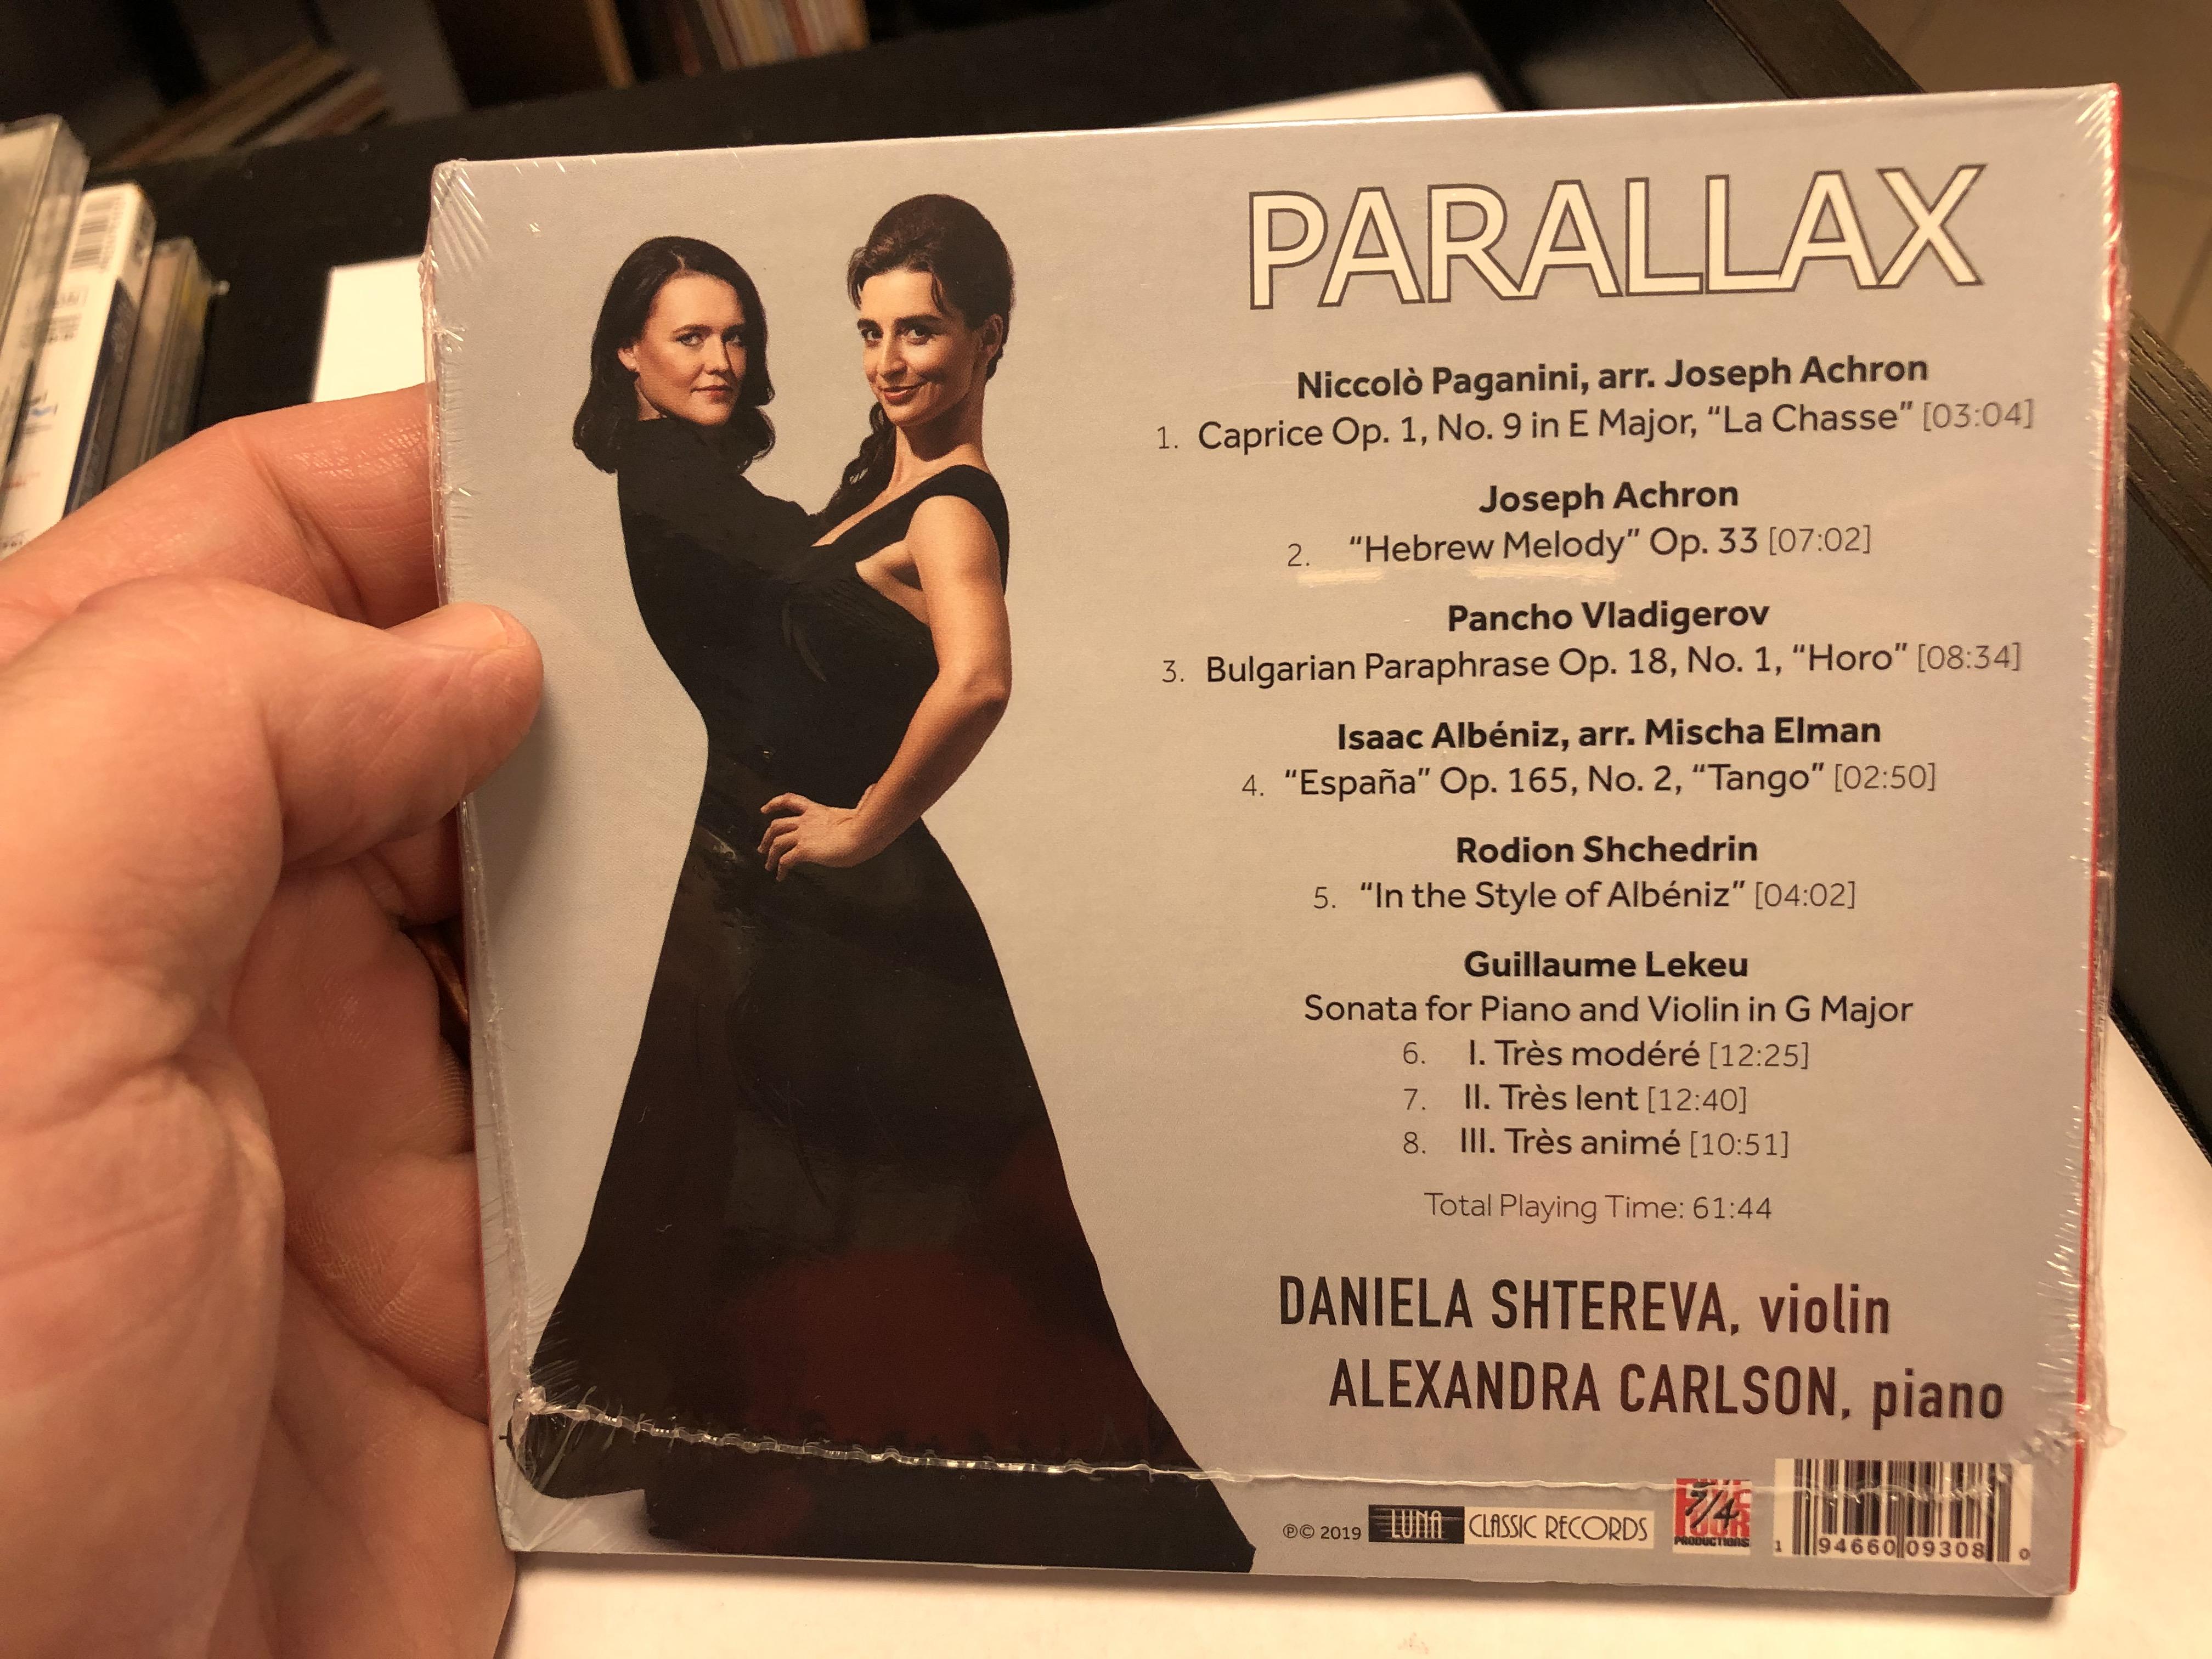 parallax-daniela-shtereva-violin-alexandra-carlson-piano-luna-classic-records-audio-cd-2019-194660093080-2-.jpg